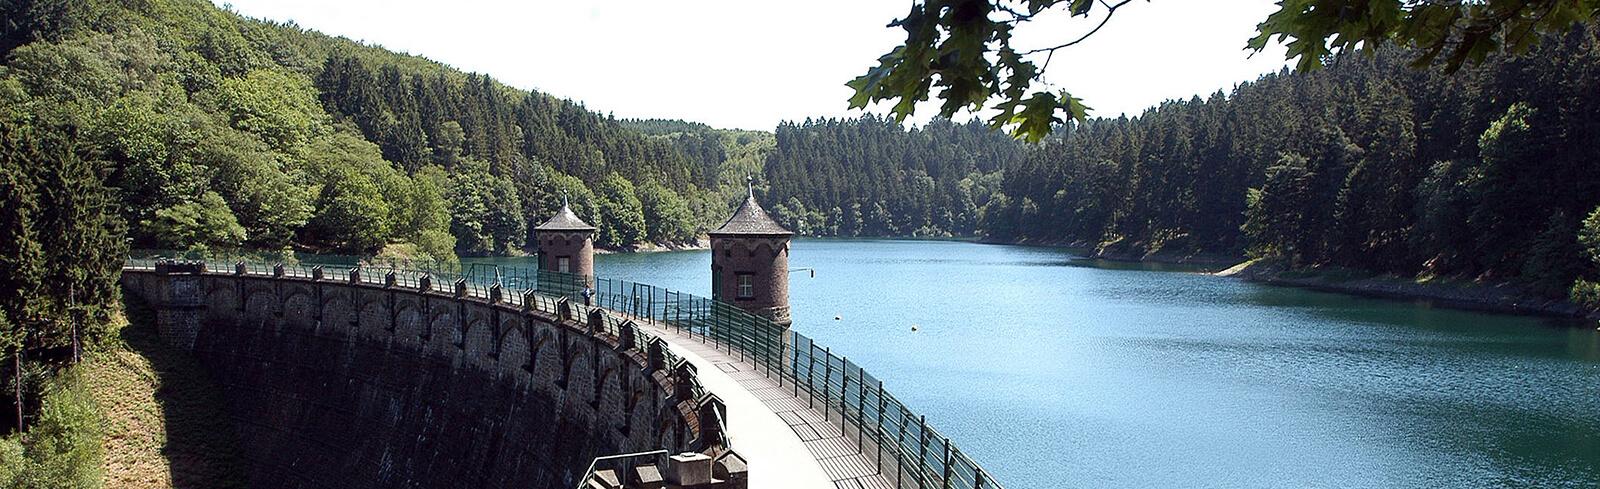 Sengbachtalsperre Solingen (Staumauer)